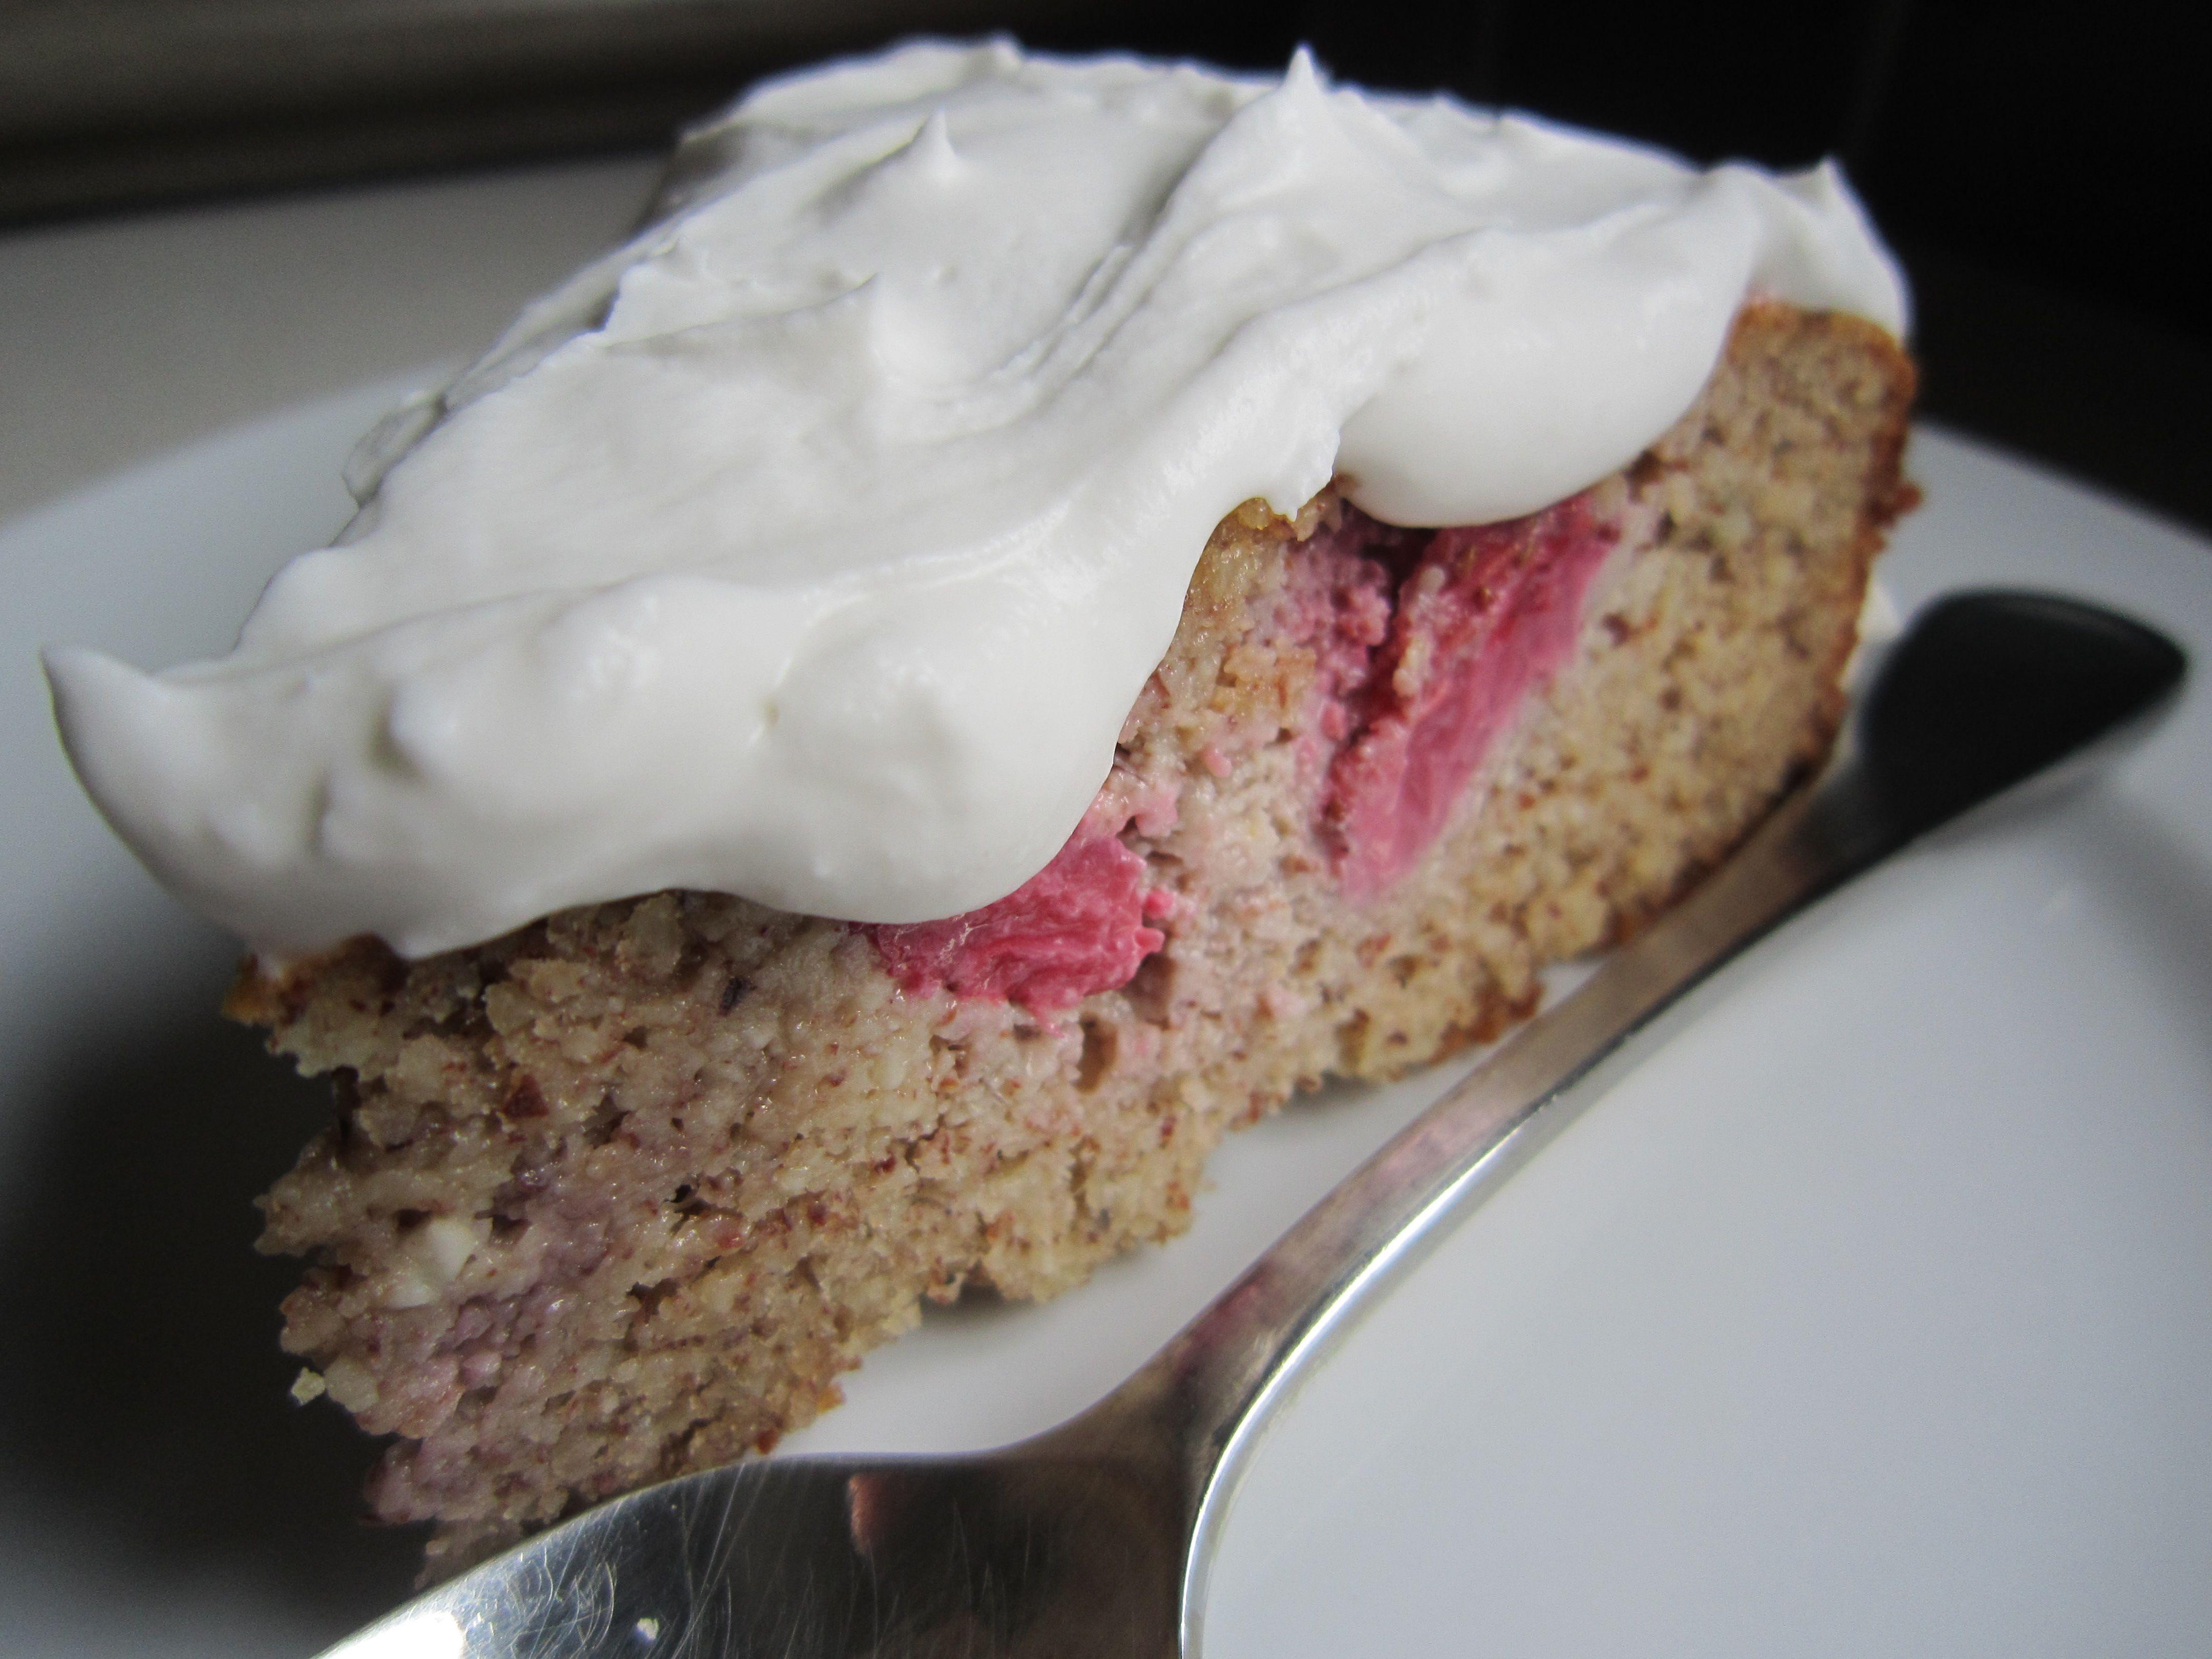 IMG3120 FOOD Desserts Pinterest Healthy birthday cakes